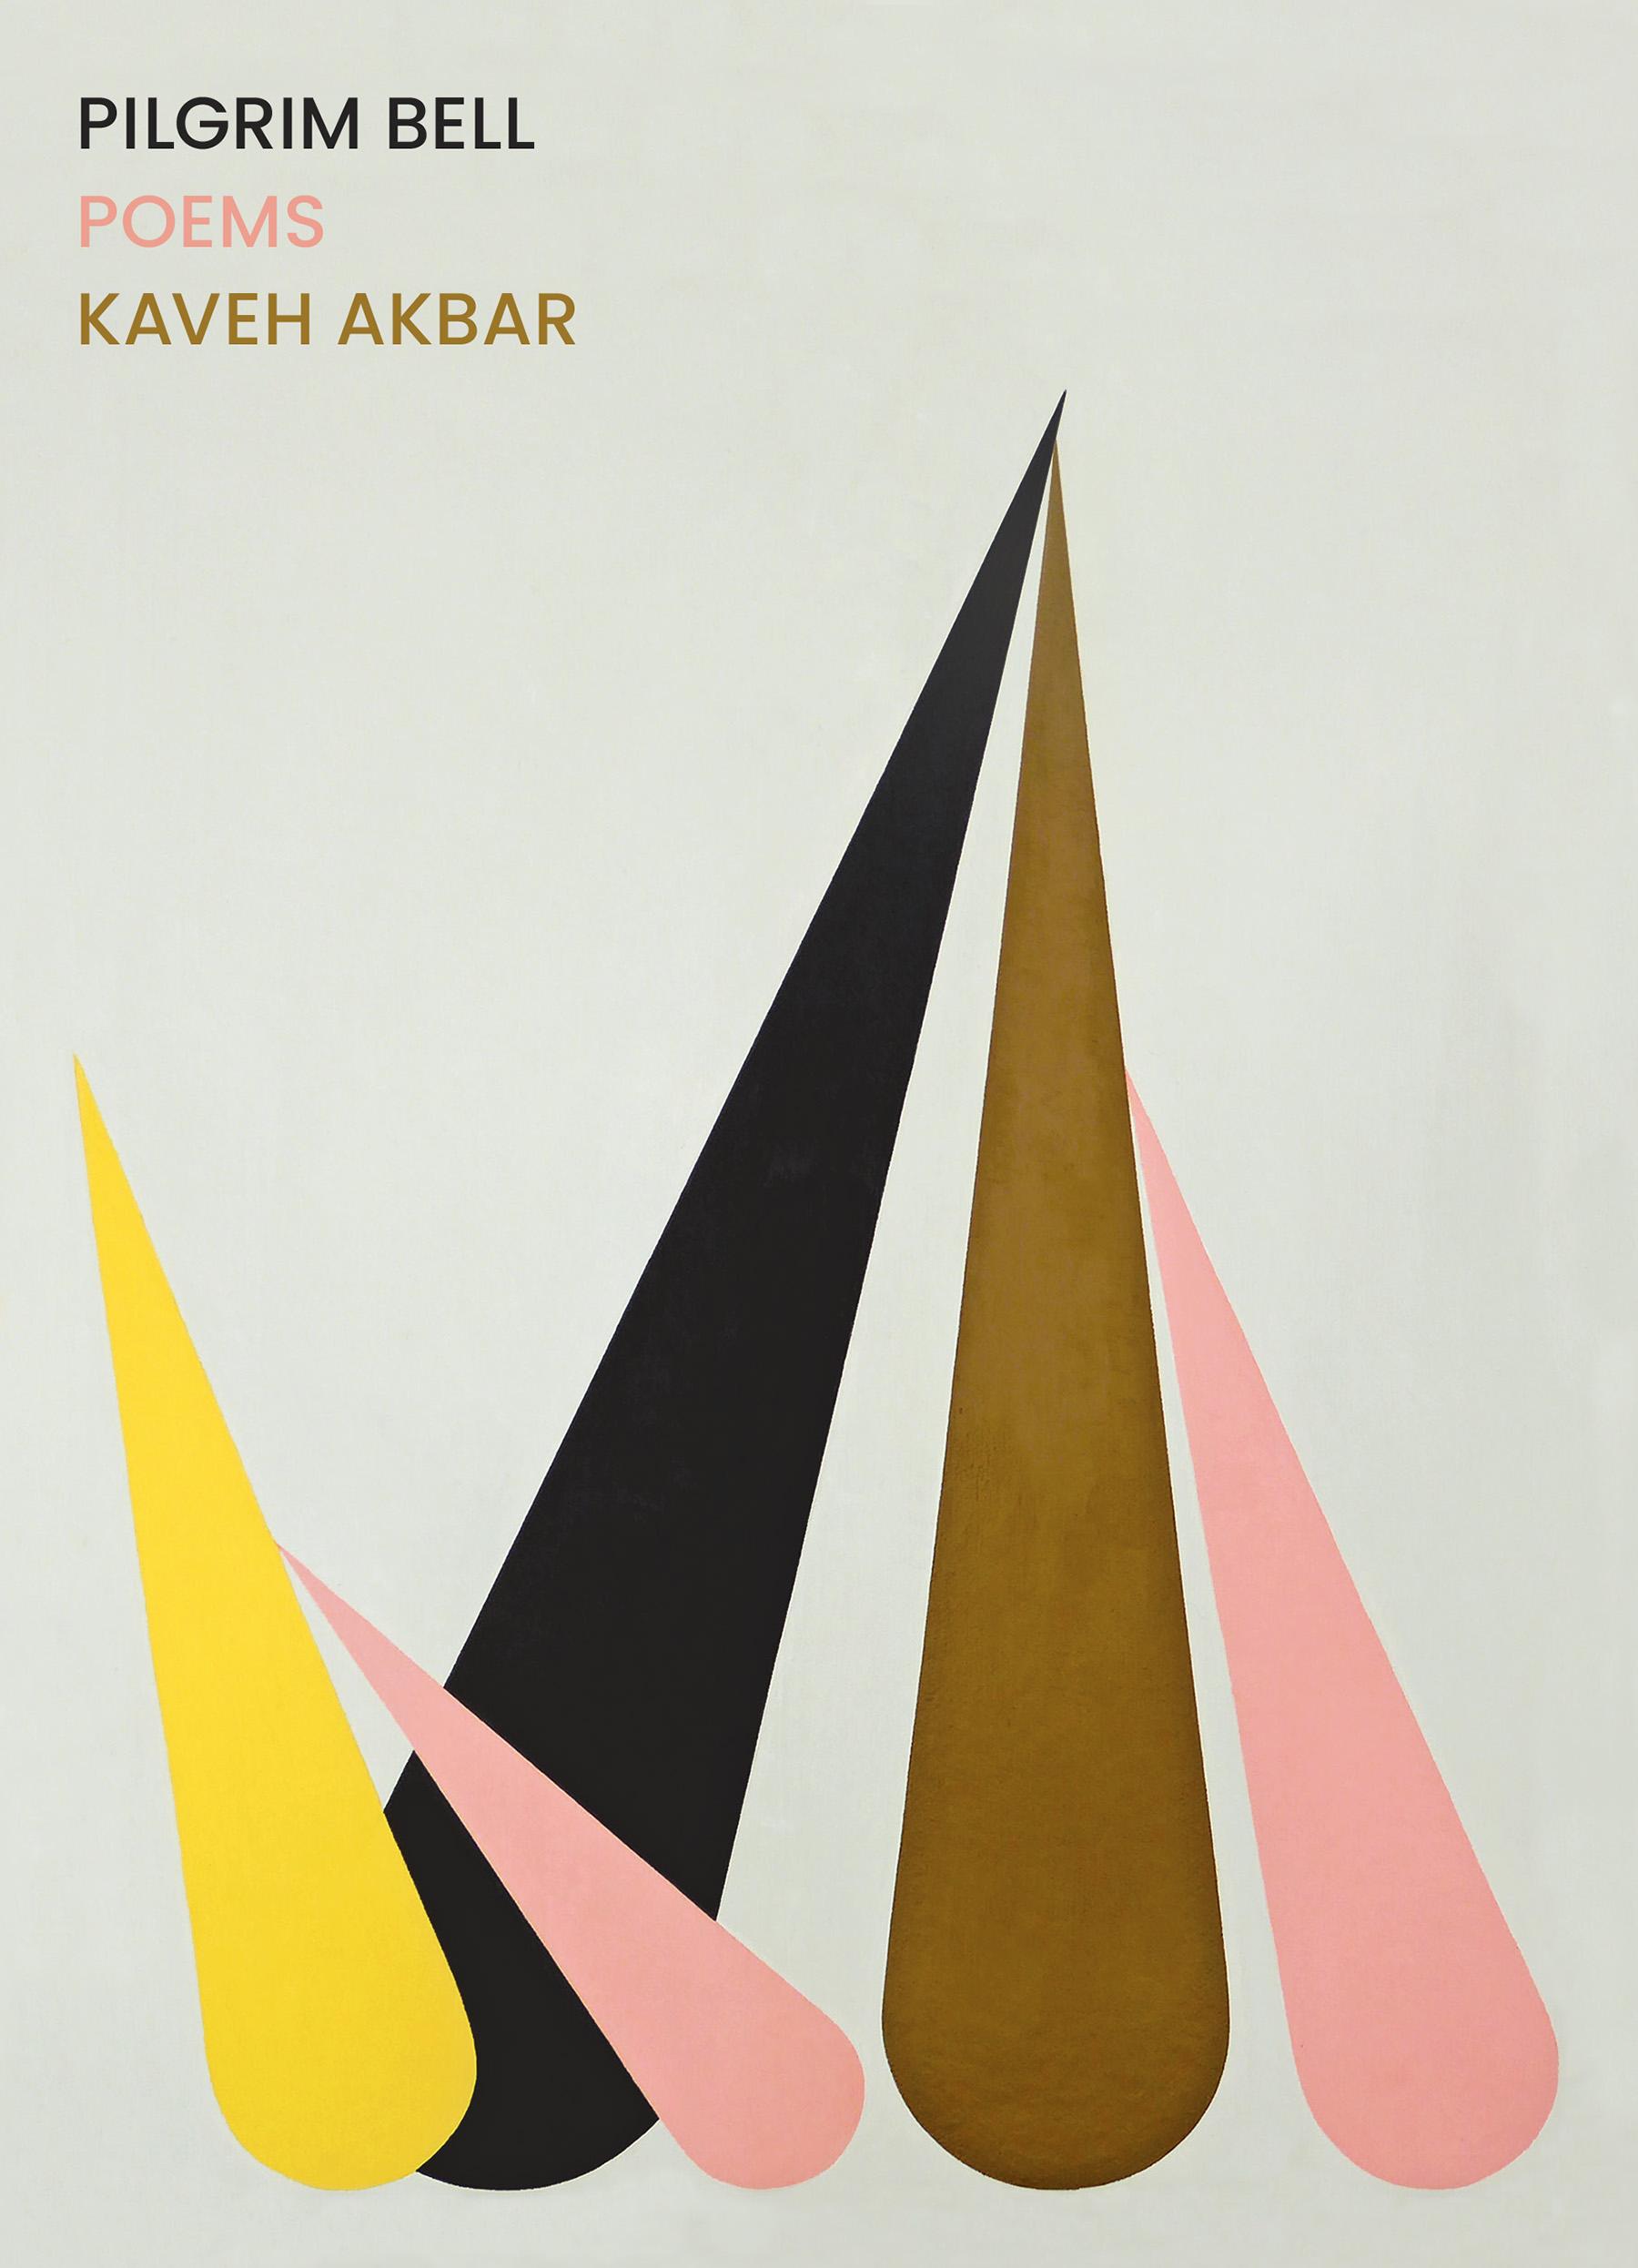 Pilgrim Bell by Kaveh Akbar